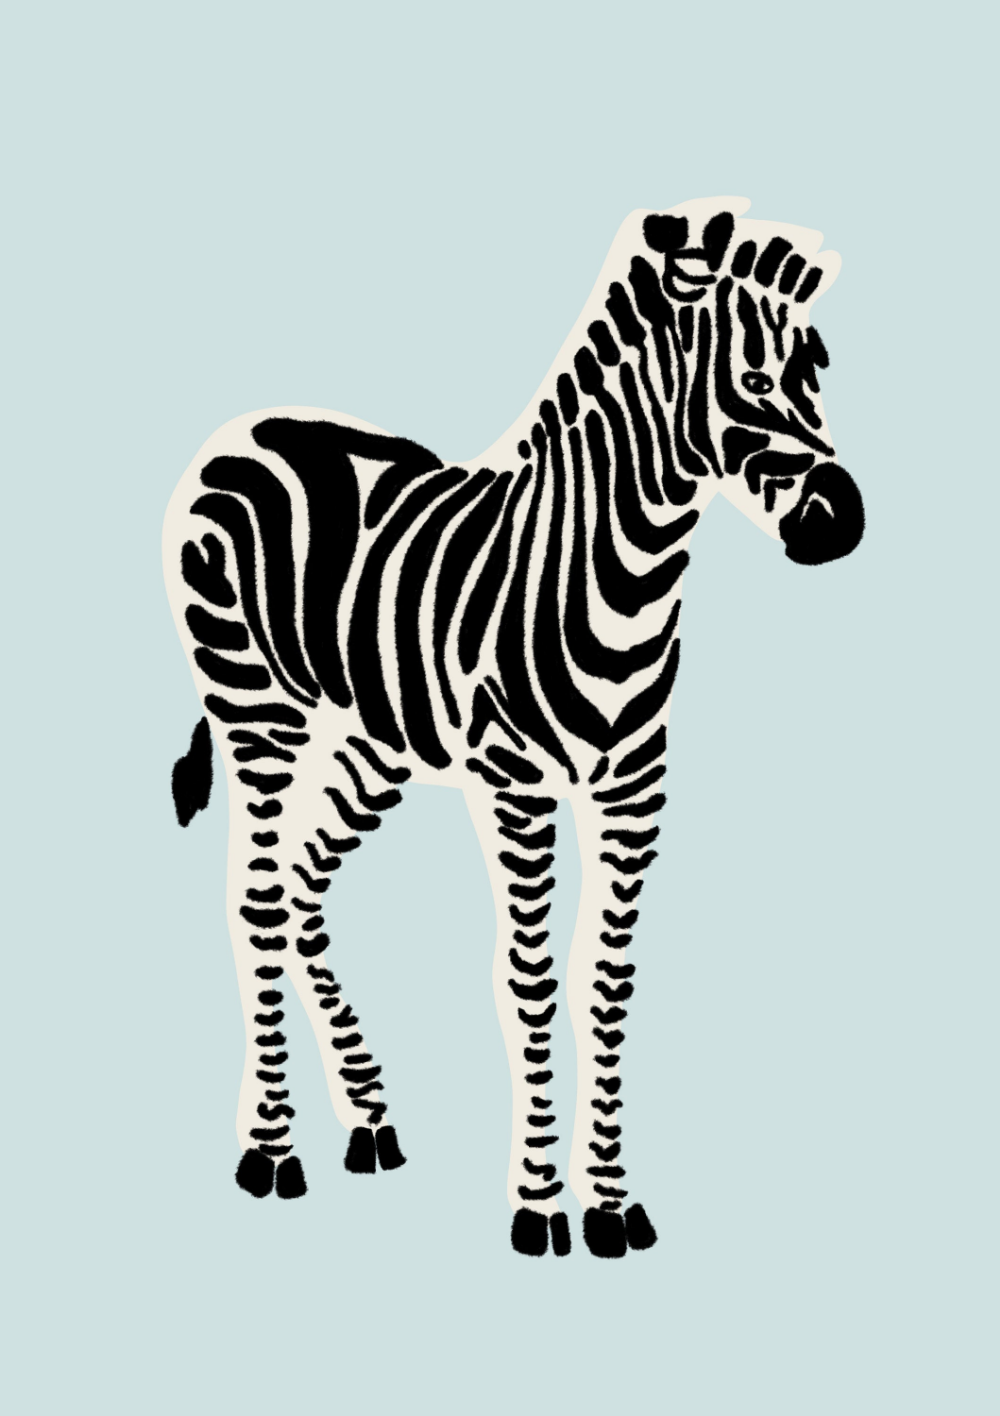 Zebra Illustration Print Modern Zebra Print Zebra Wall Art